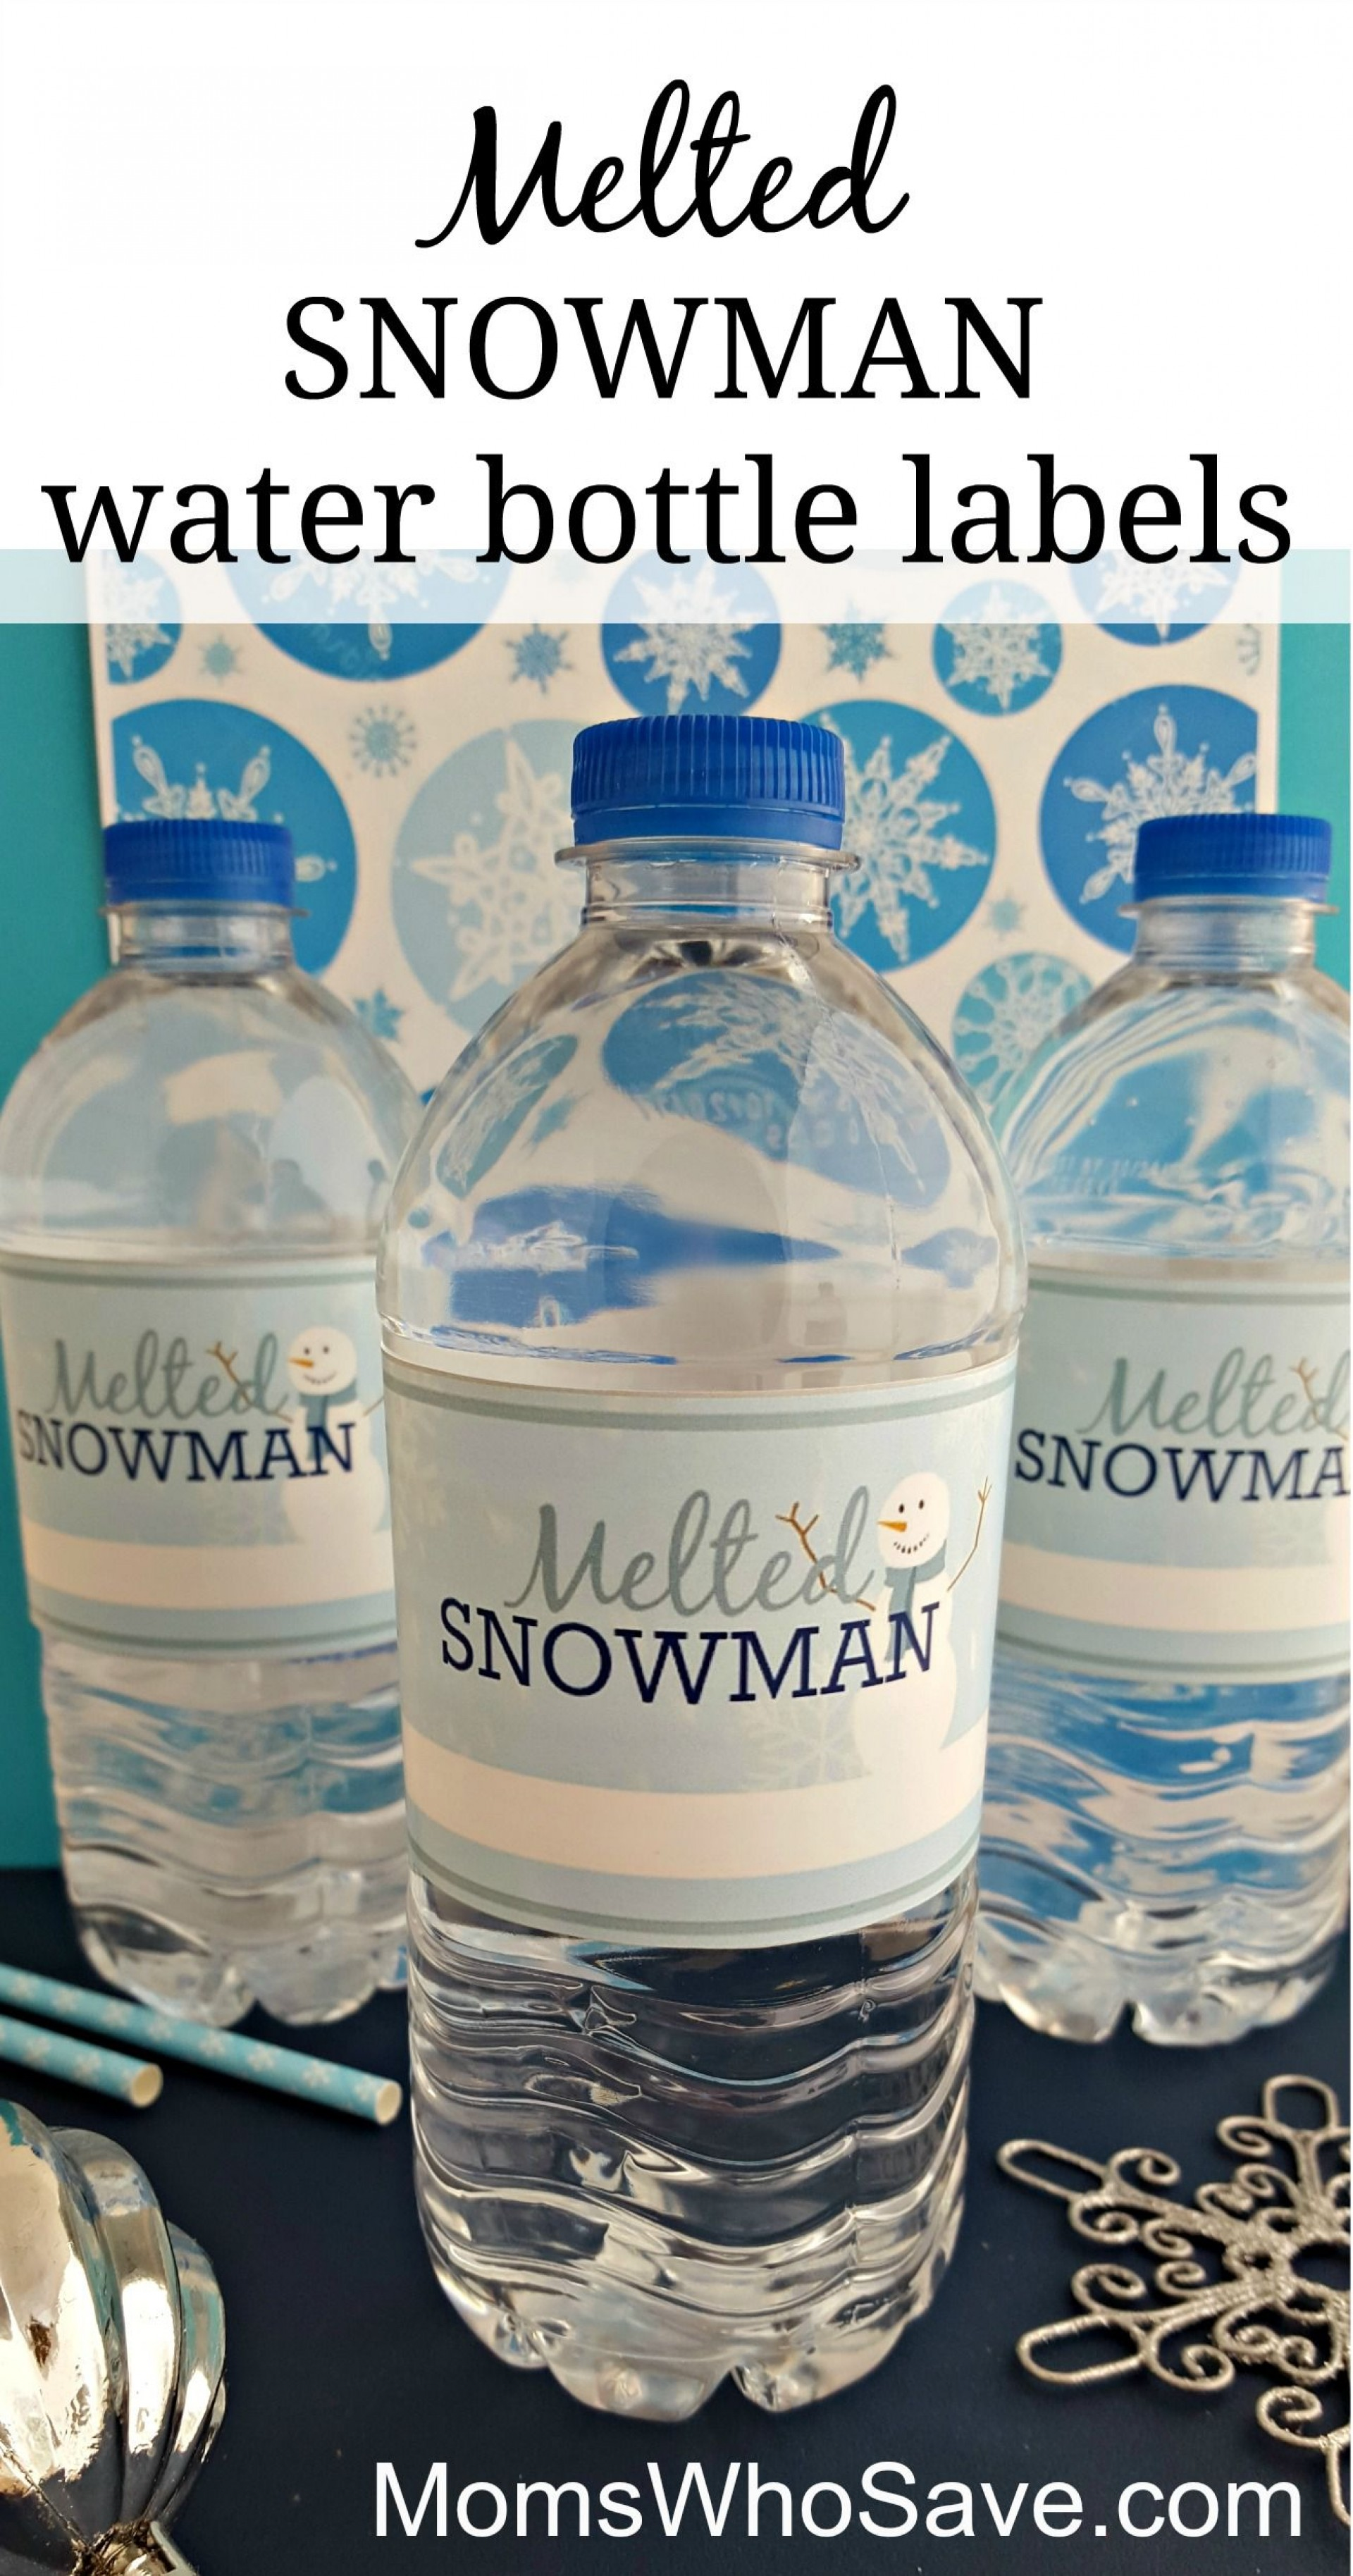 008 Wondrou Diy Water Bottle Label Template Free Inspiration 1920